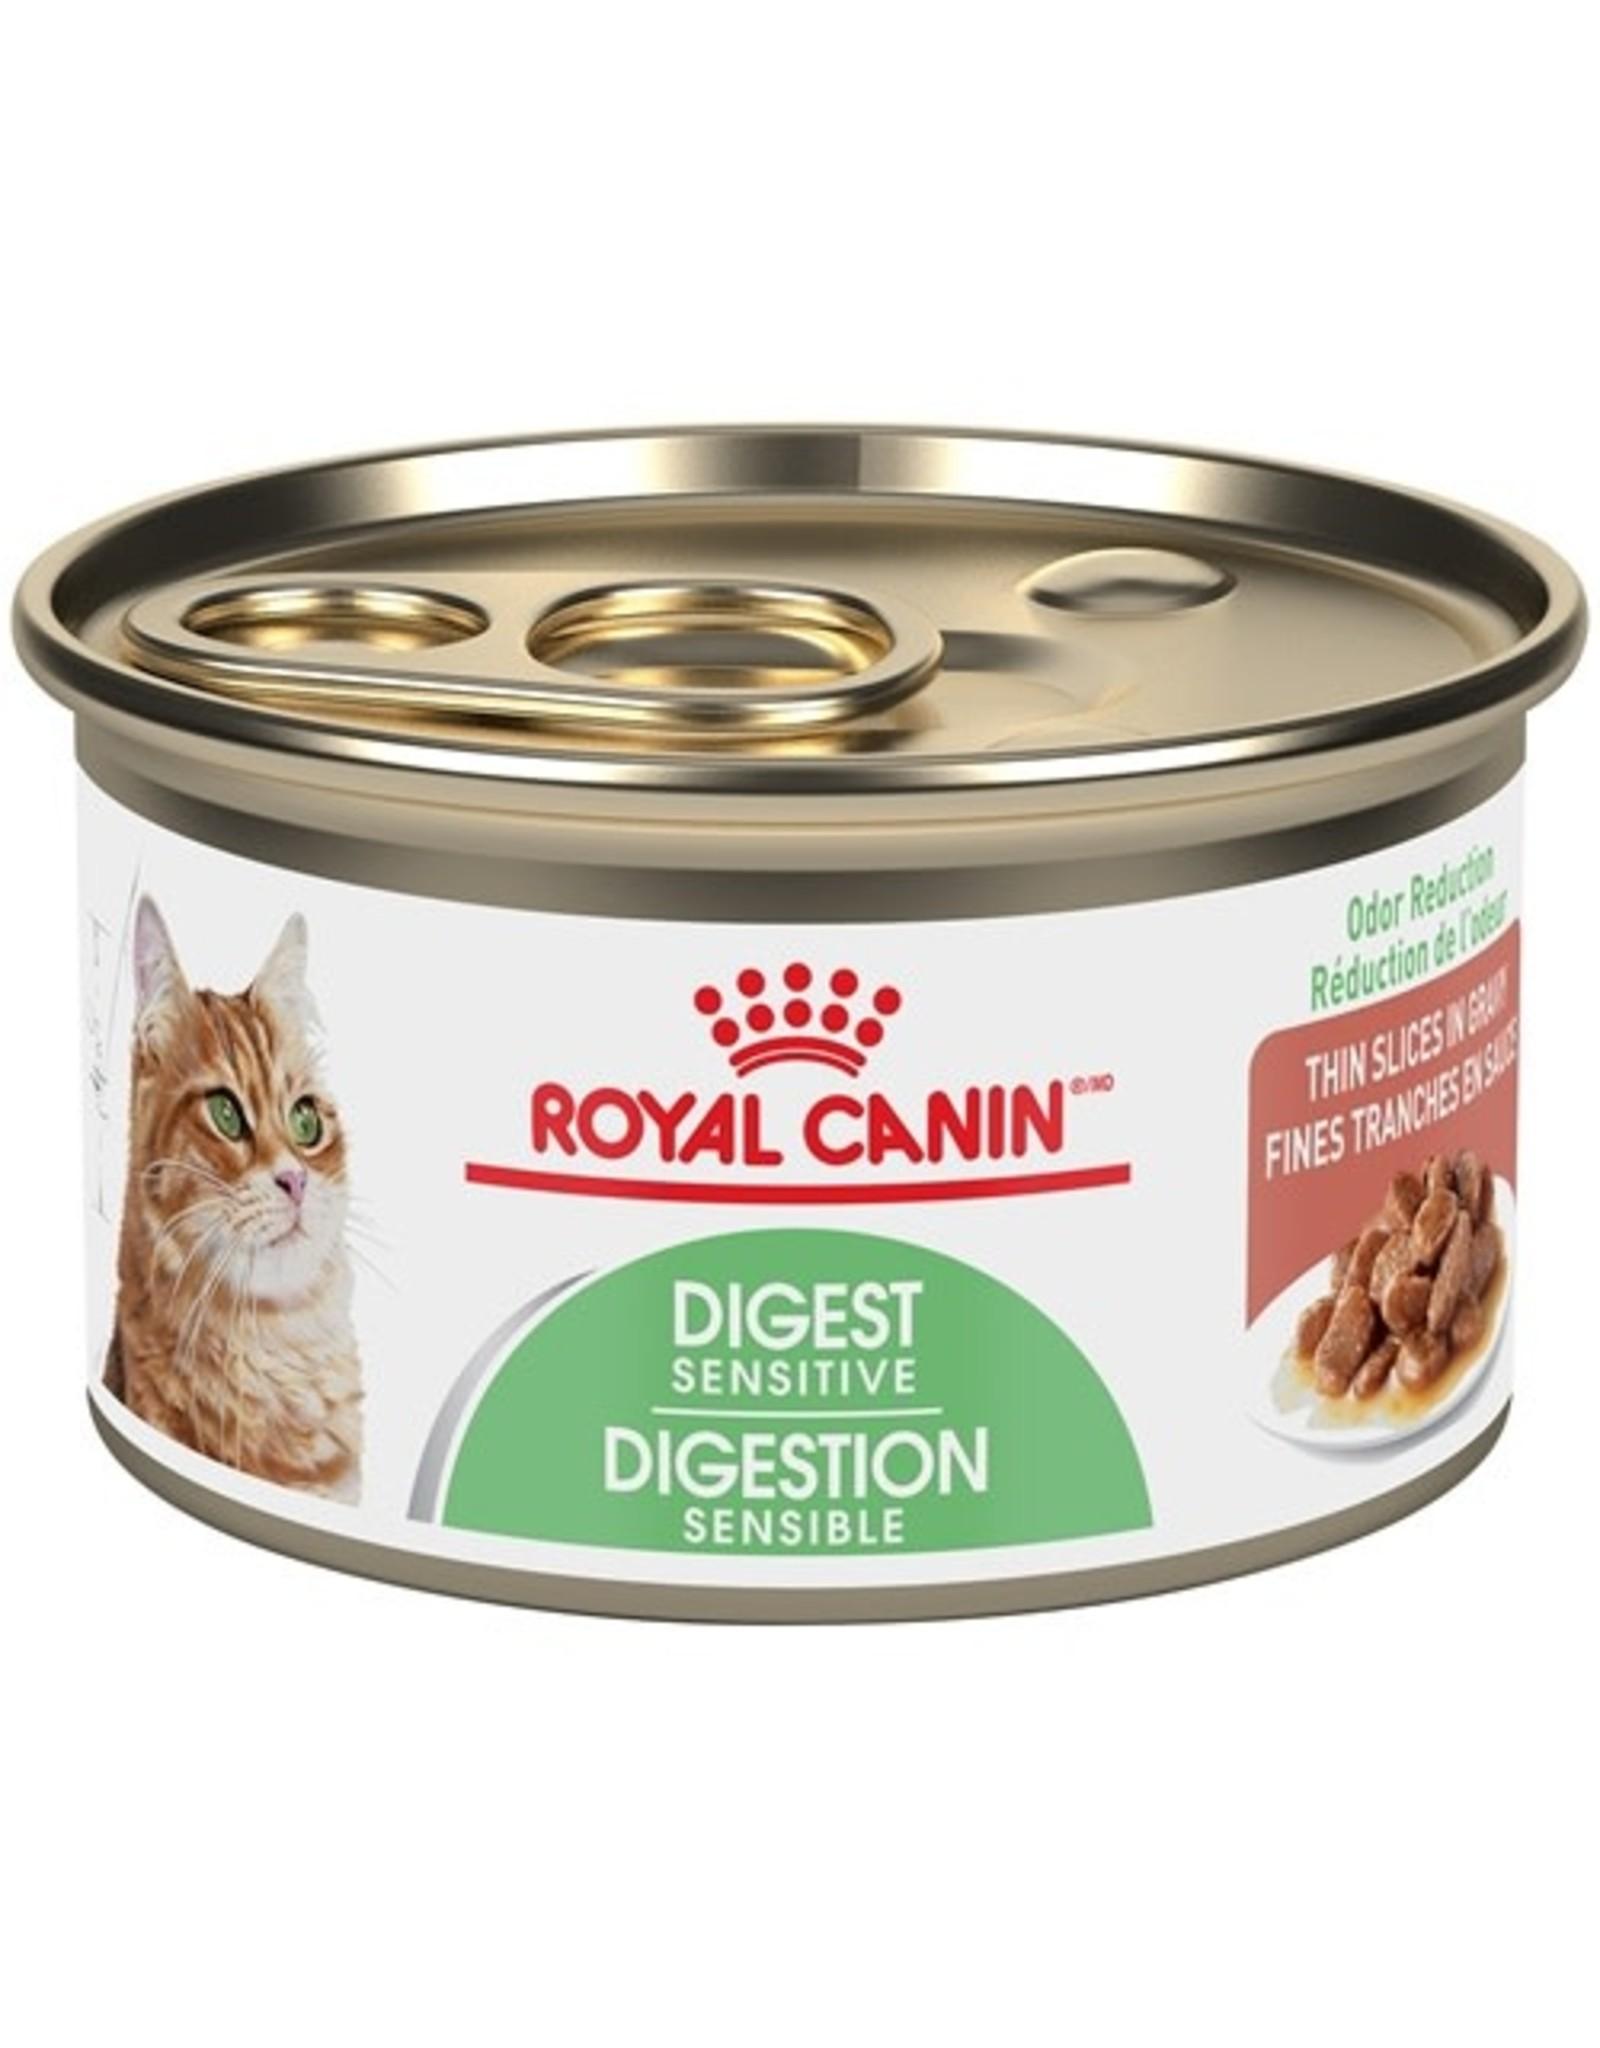 Royal Canin Royal Canin Digest Sensitive 85g